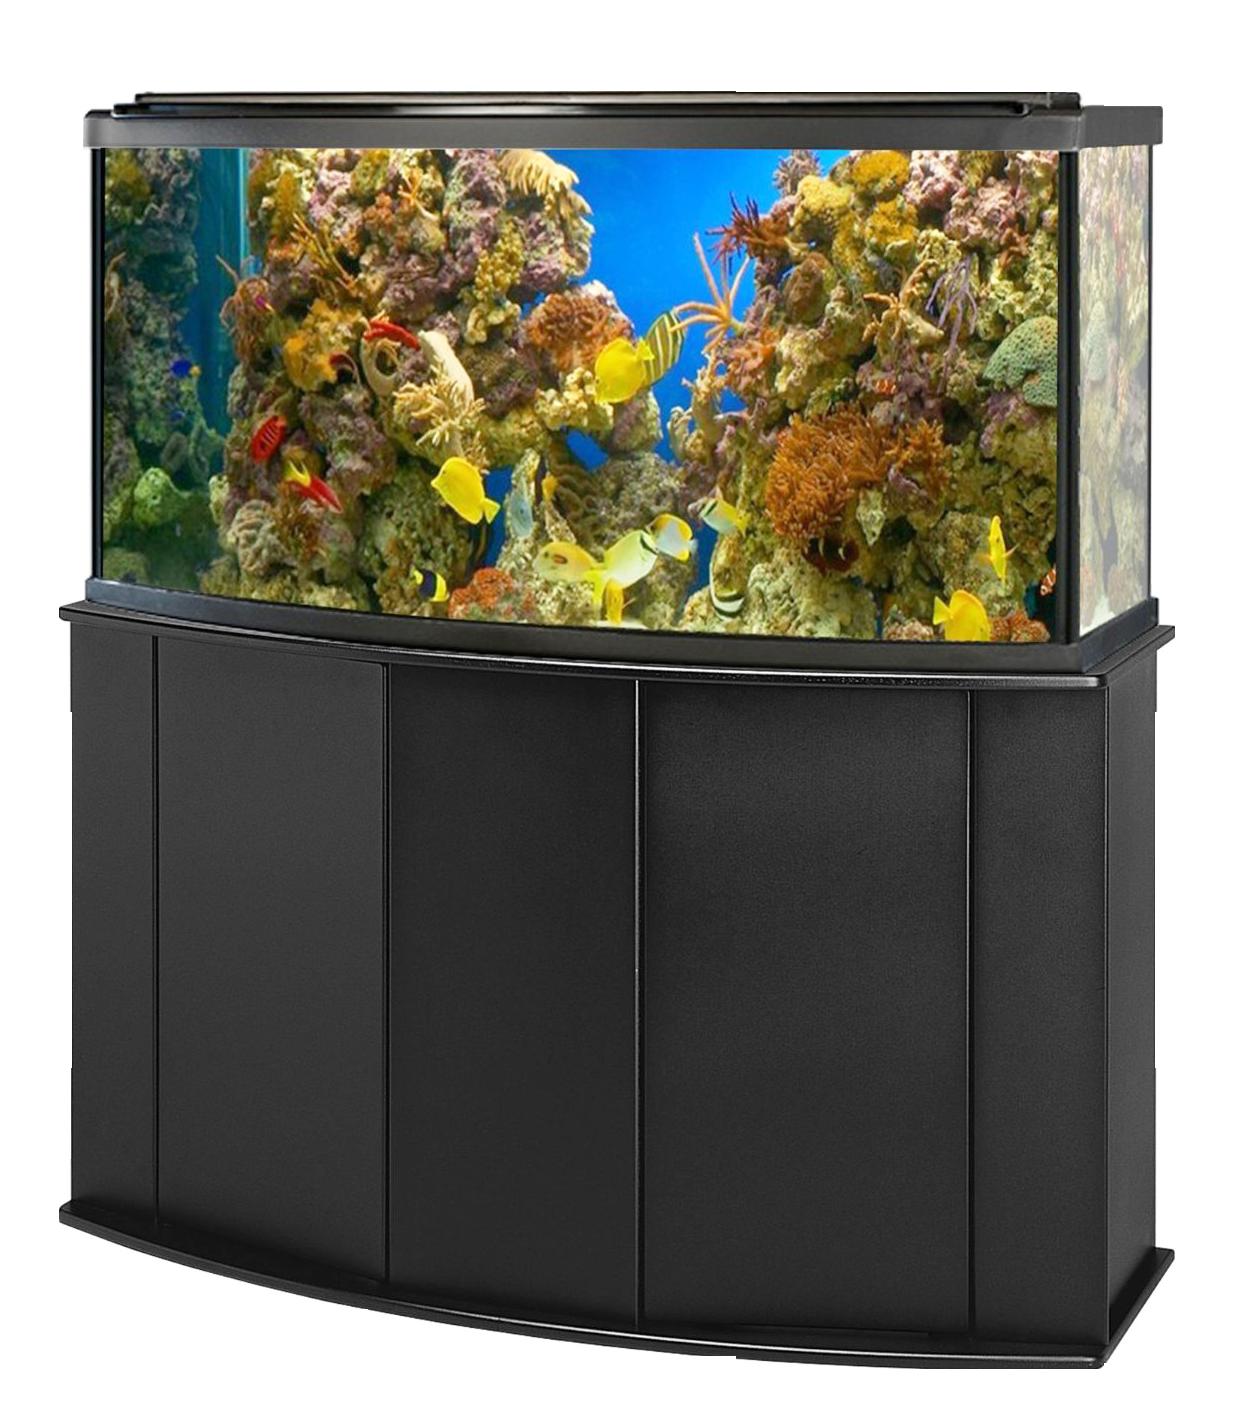 Fish tank coral clipart png black and white library Aquarium Fish Tank PNG Image - PurePNG | Free transparent CC0 PNG ... png black and white library